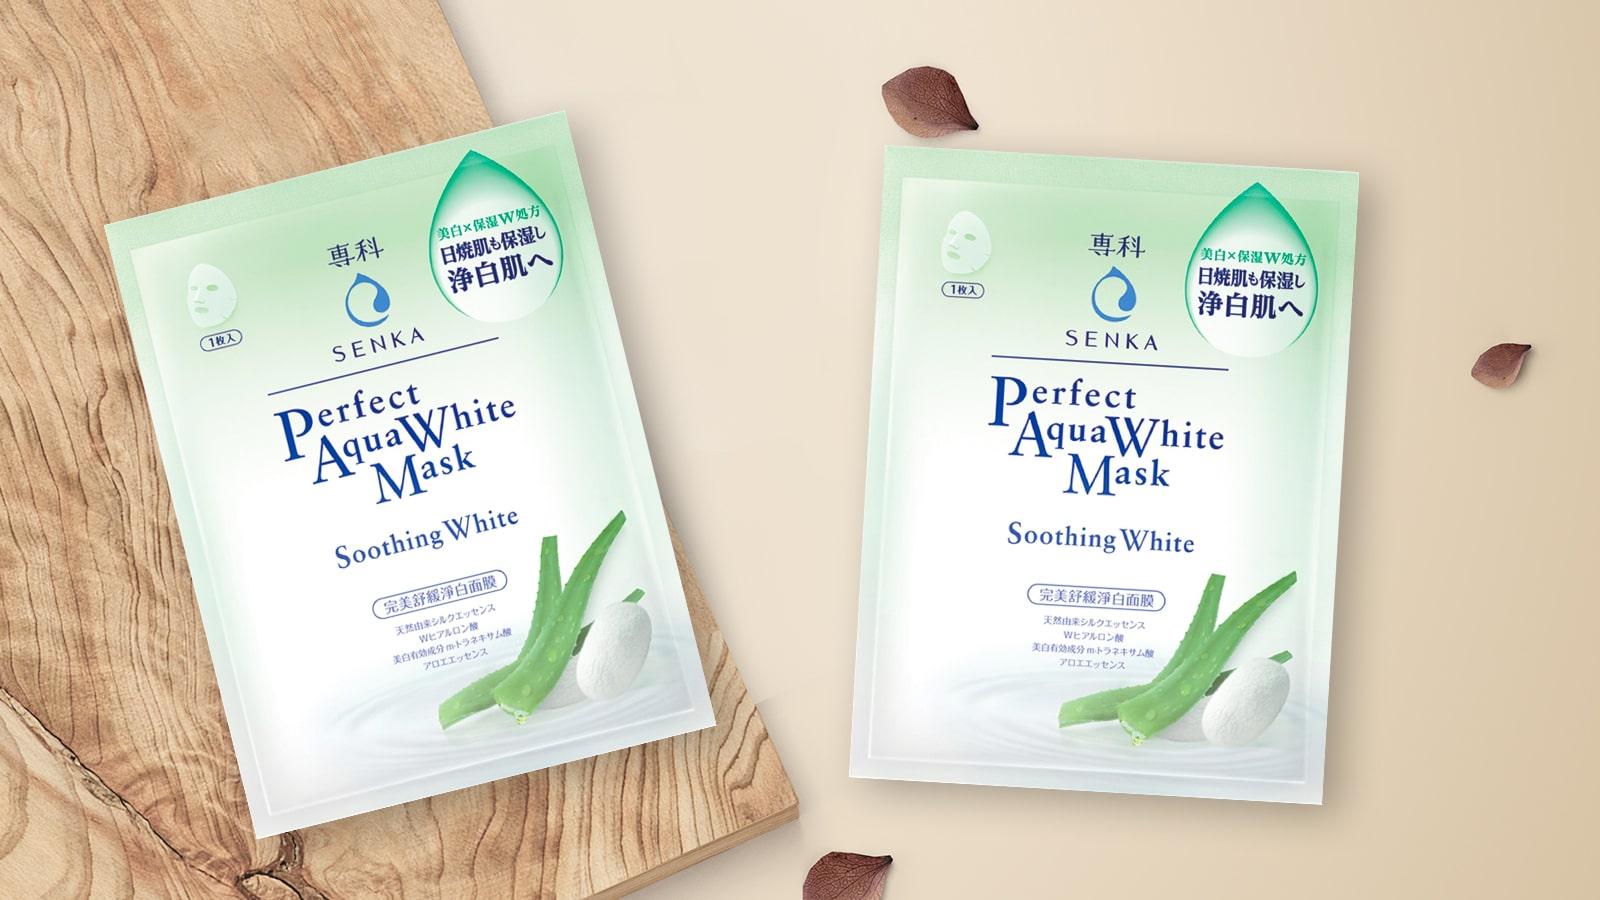 Mặt Nạ Senka Perfect Aqua White #Soothing White 1 miếng